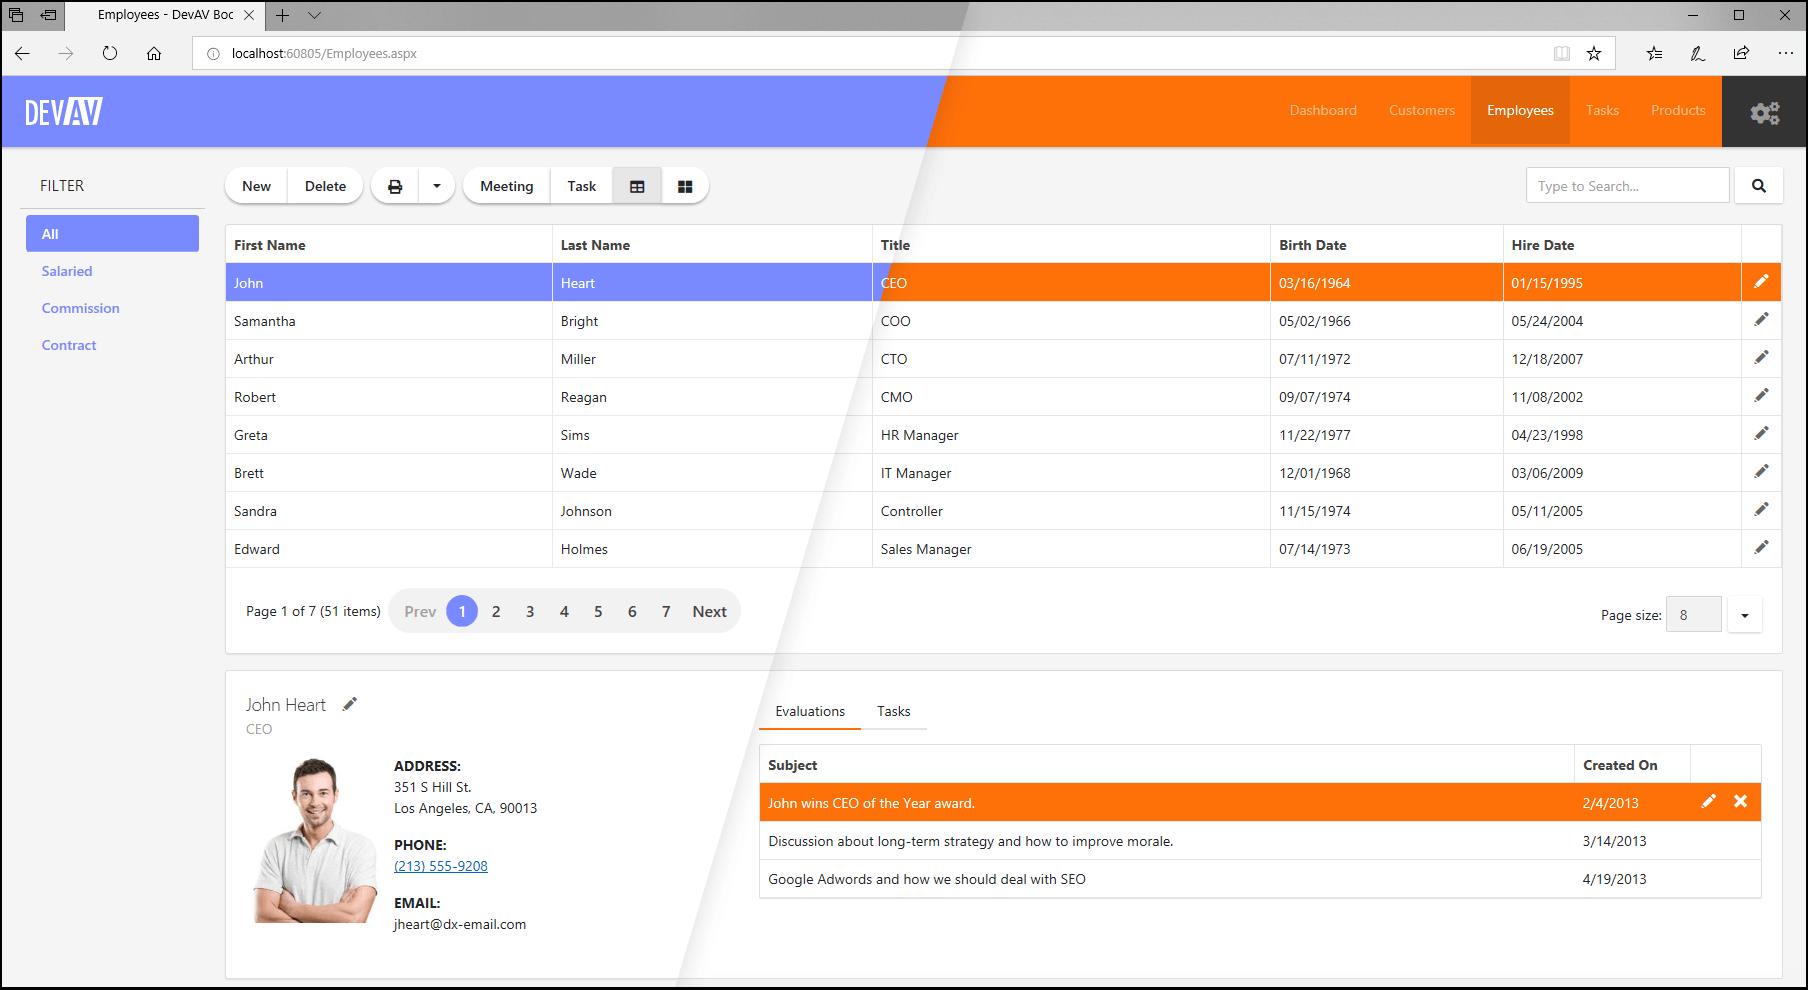 DevExpress WPF示例:使用MVVM模式将RichEditControl绑定到文档源